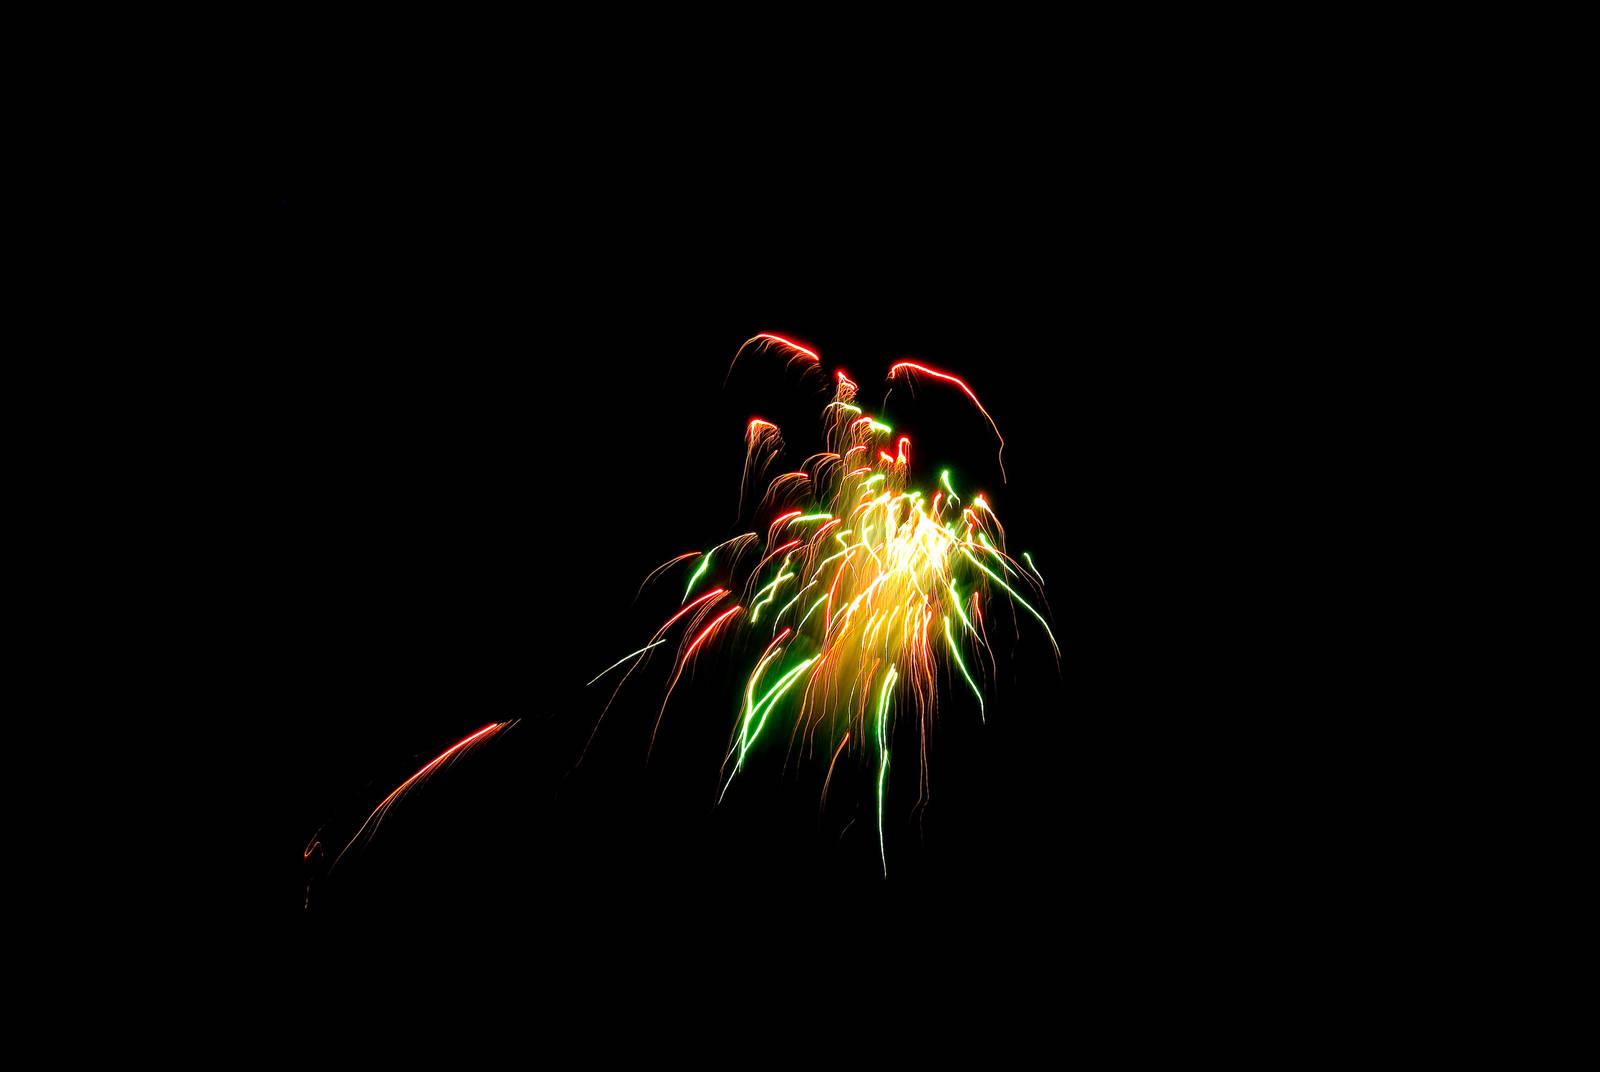 Fireworks 7-4-2010 No.3 STOCK by slephoto